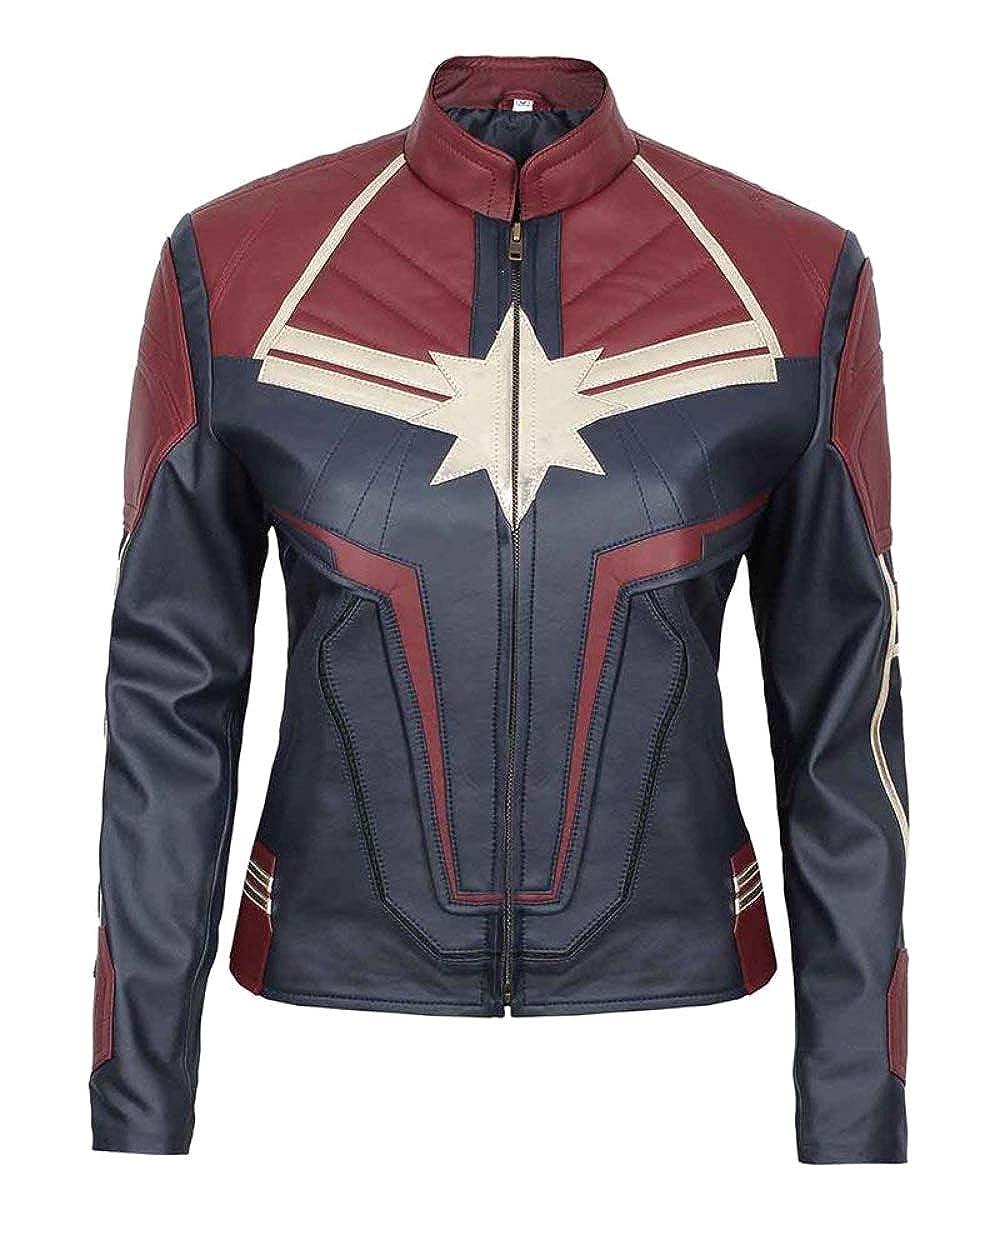 Stopnbuy Carol Danvers Captain Marvel Jacket 2019